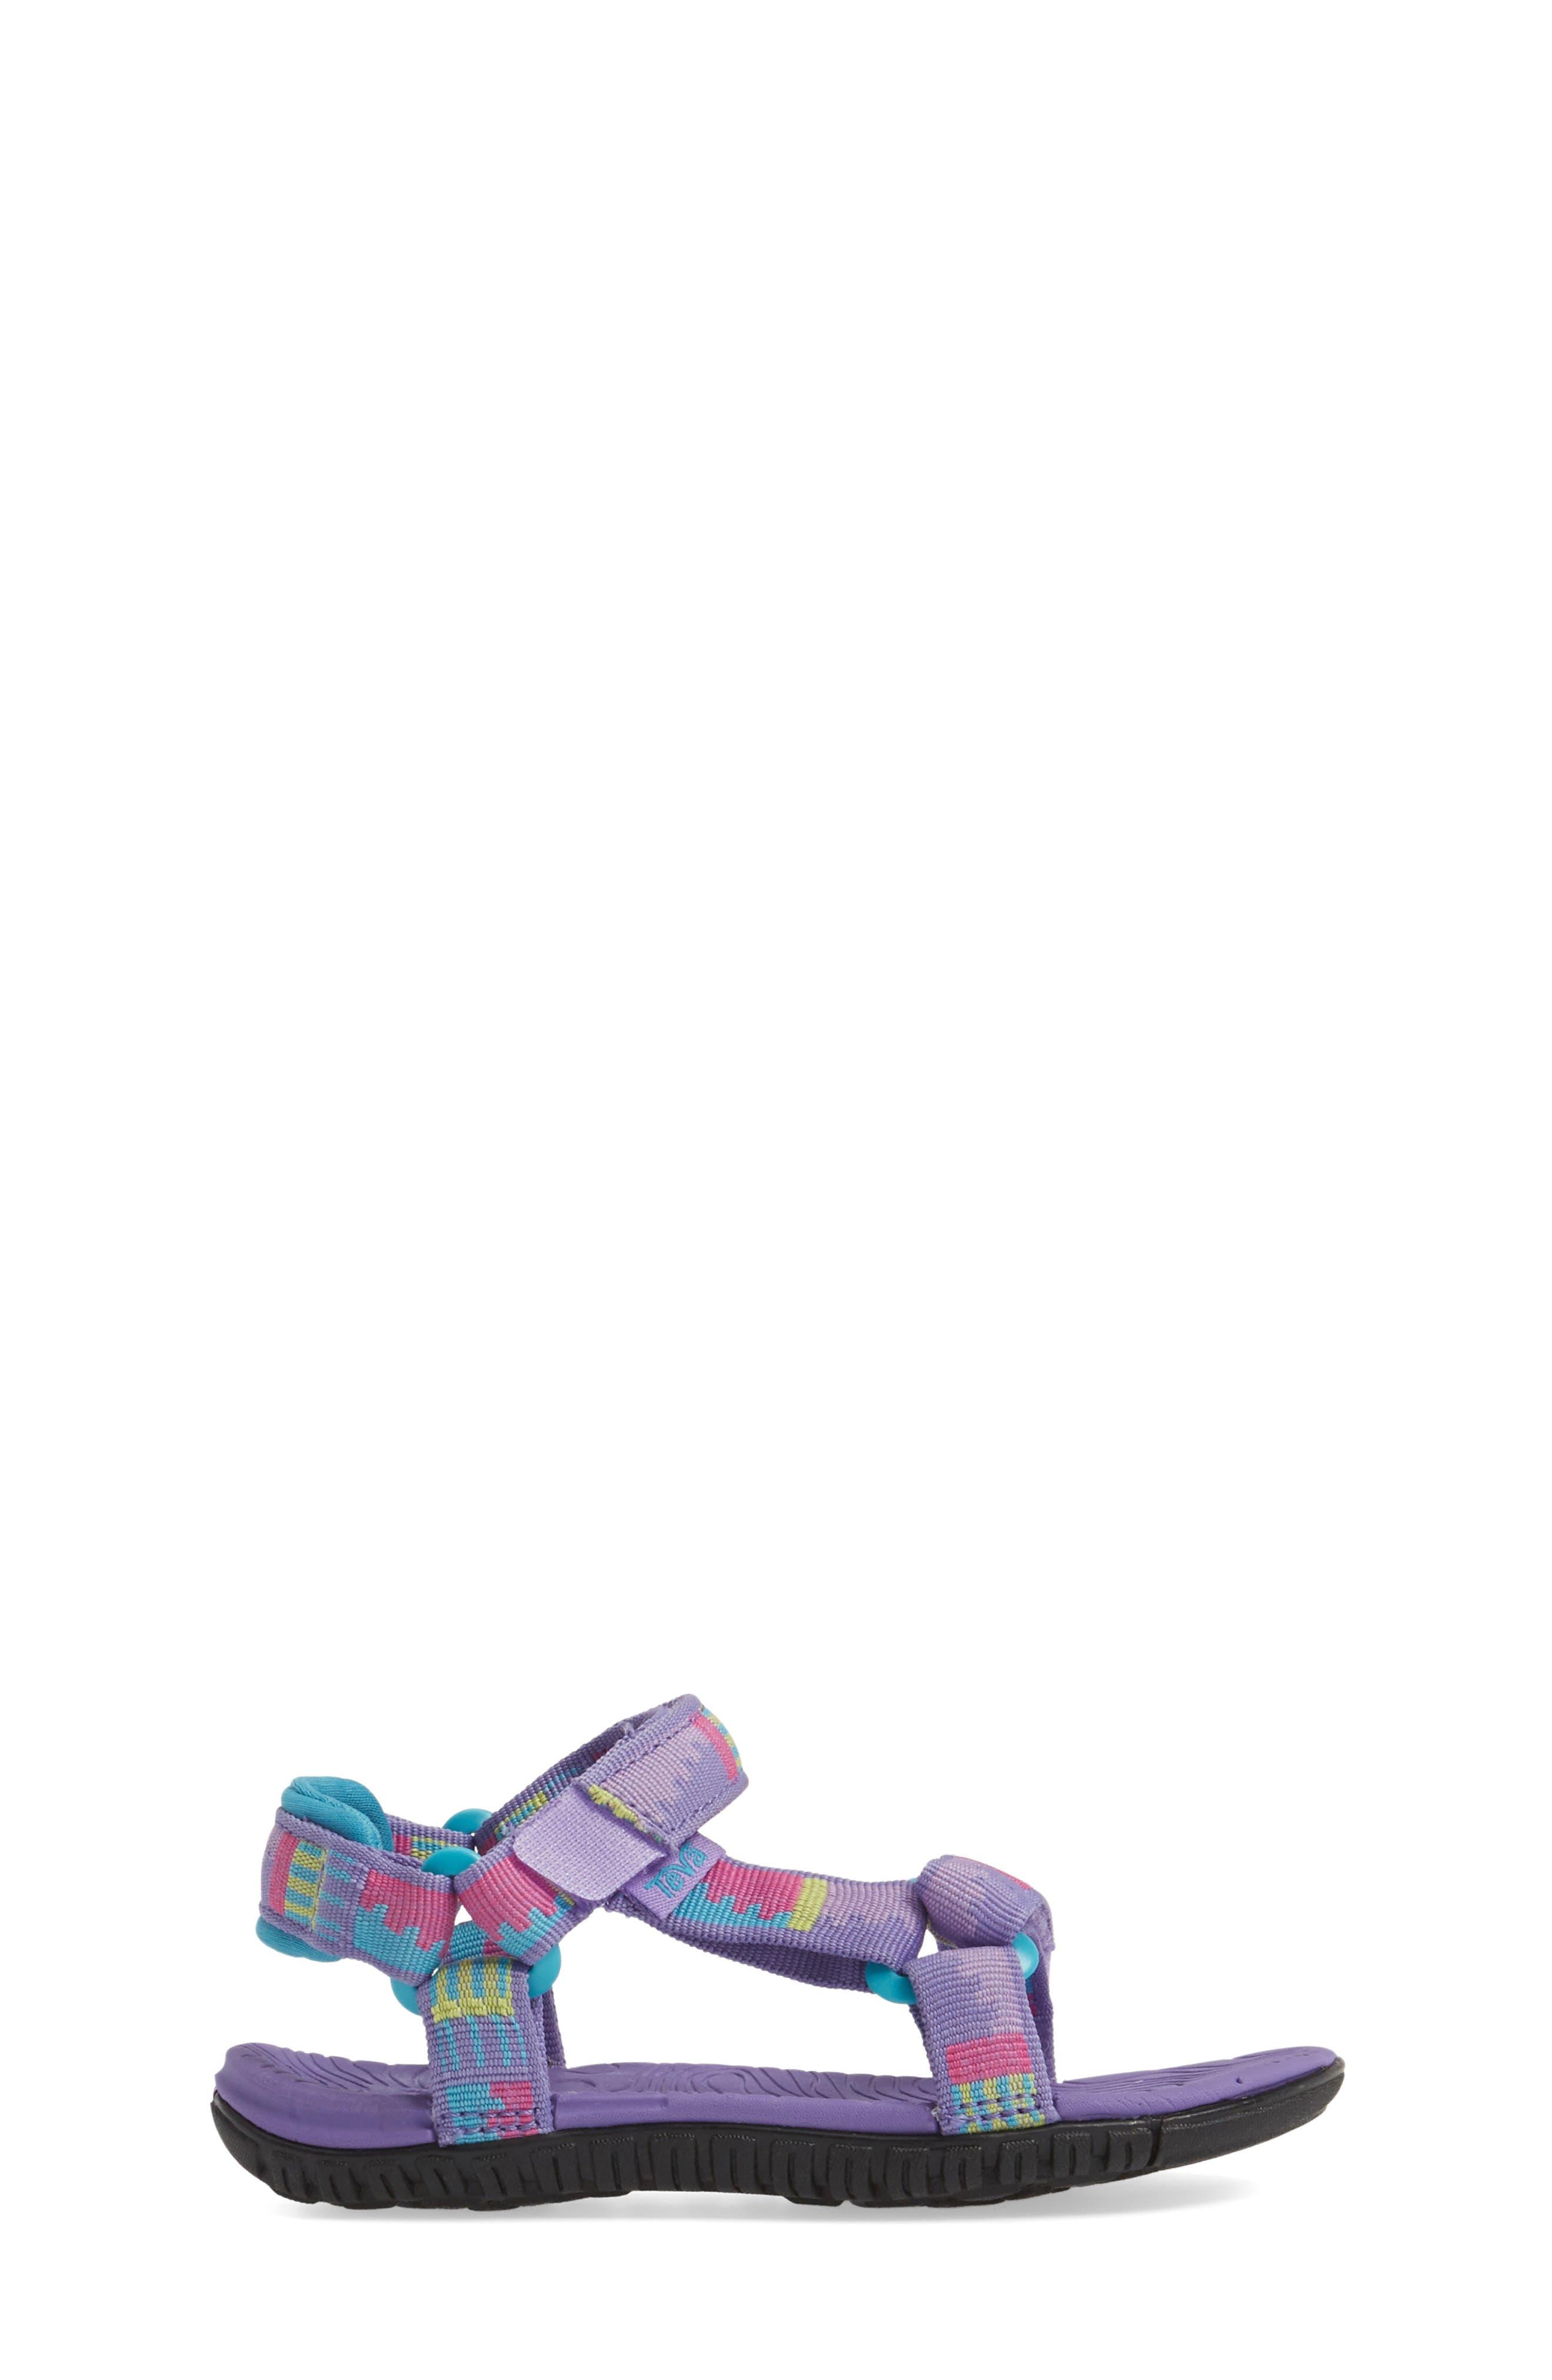 'Hurricane 3' Sport Sandal,                             Alternate thumbnail 3, color,                             Purple